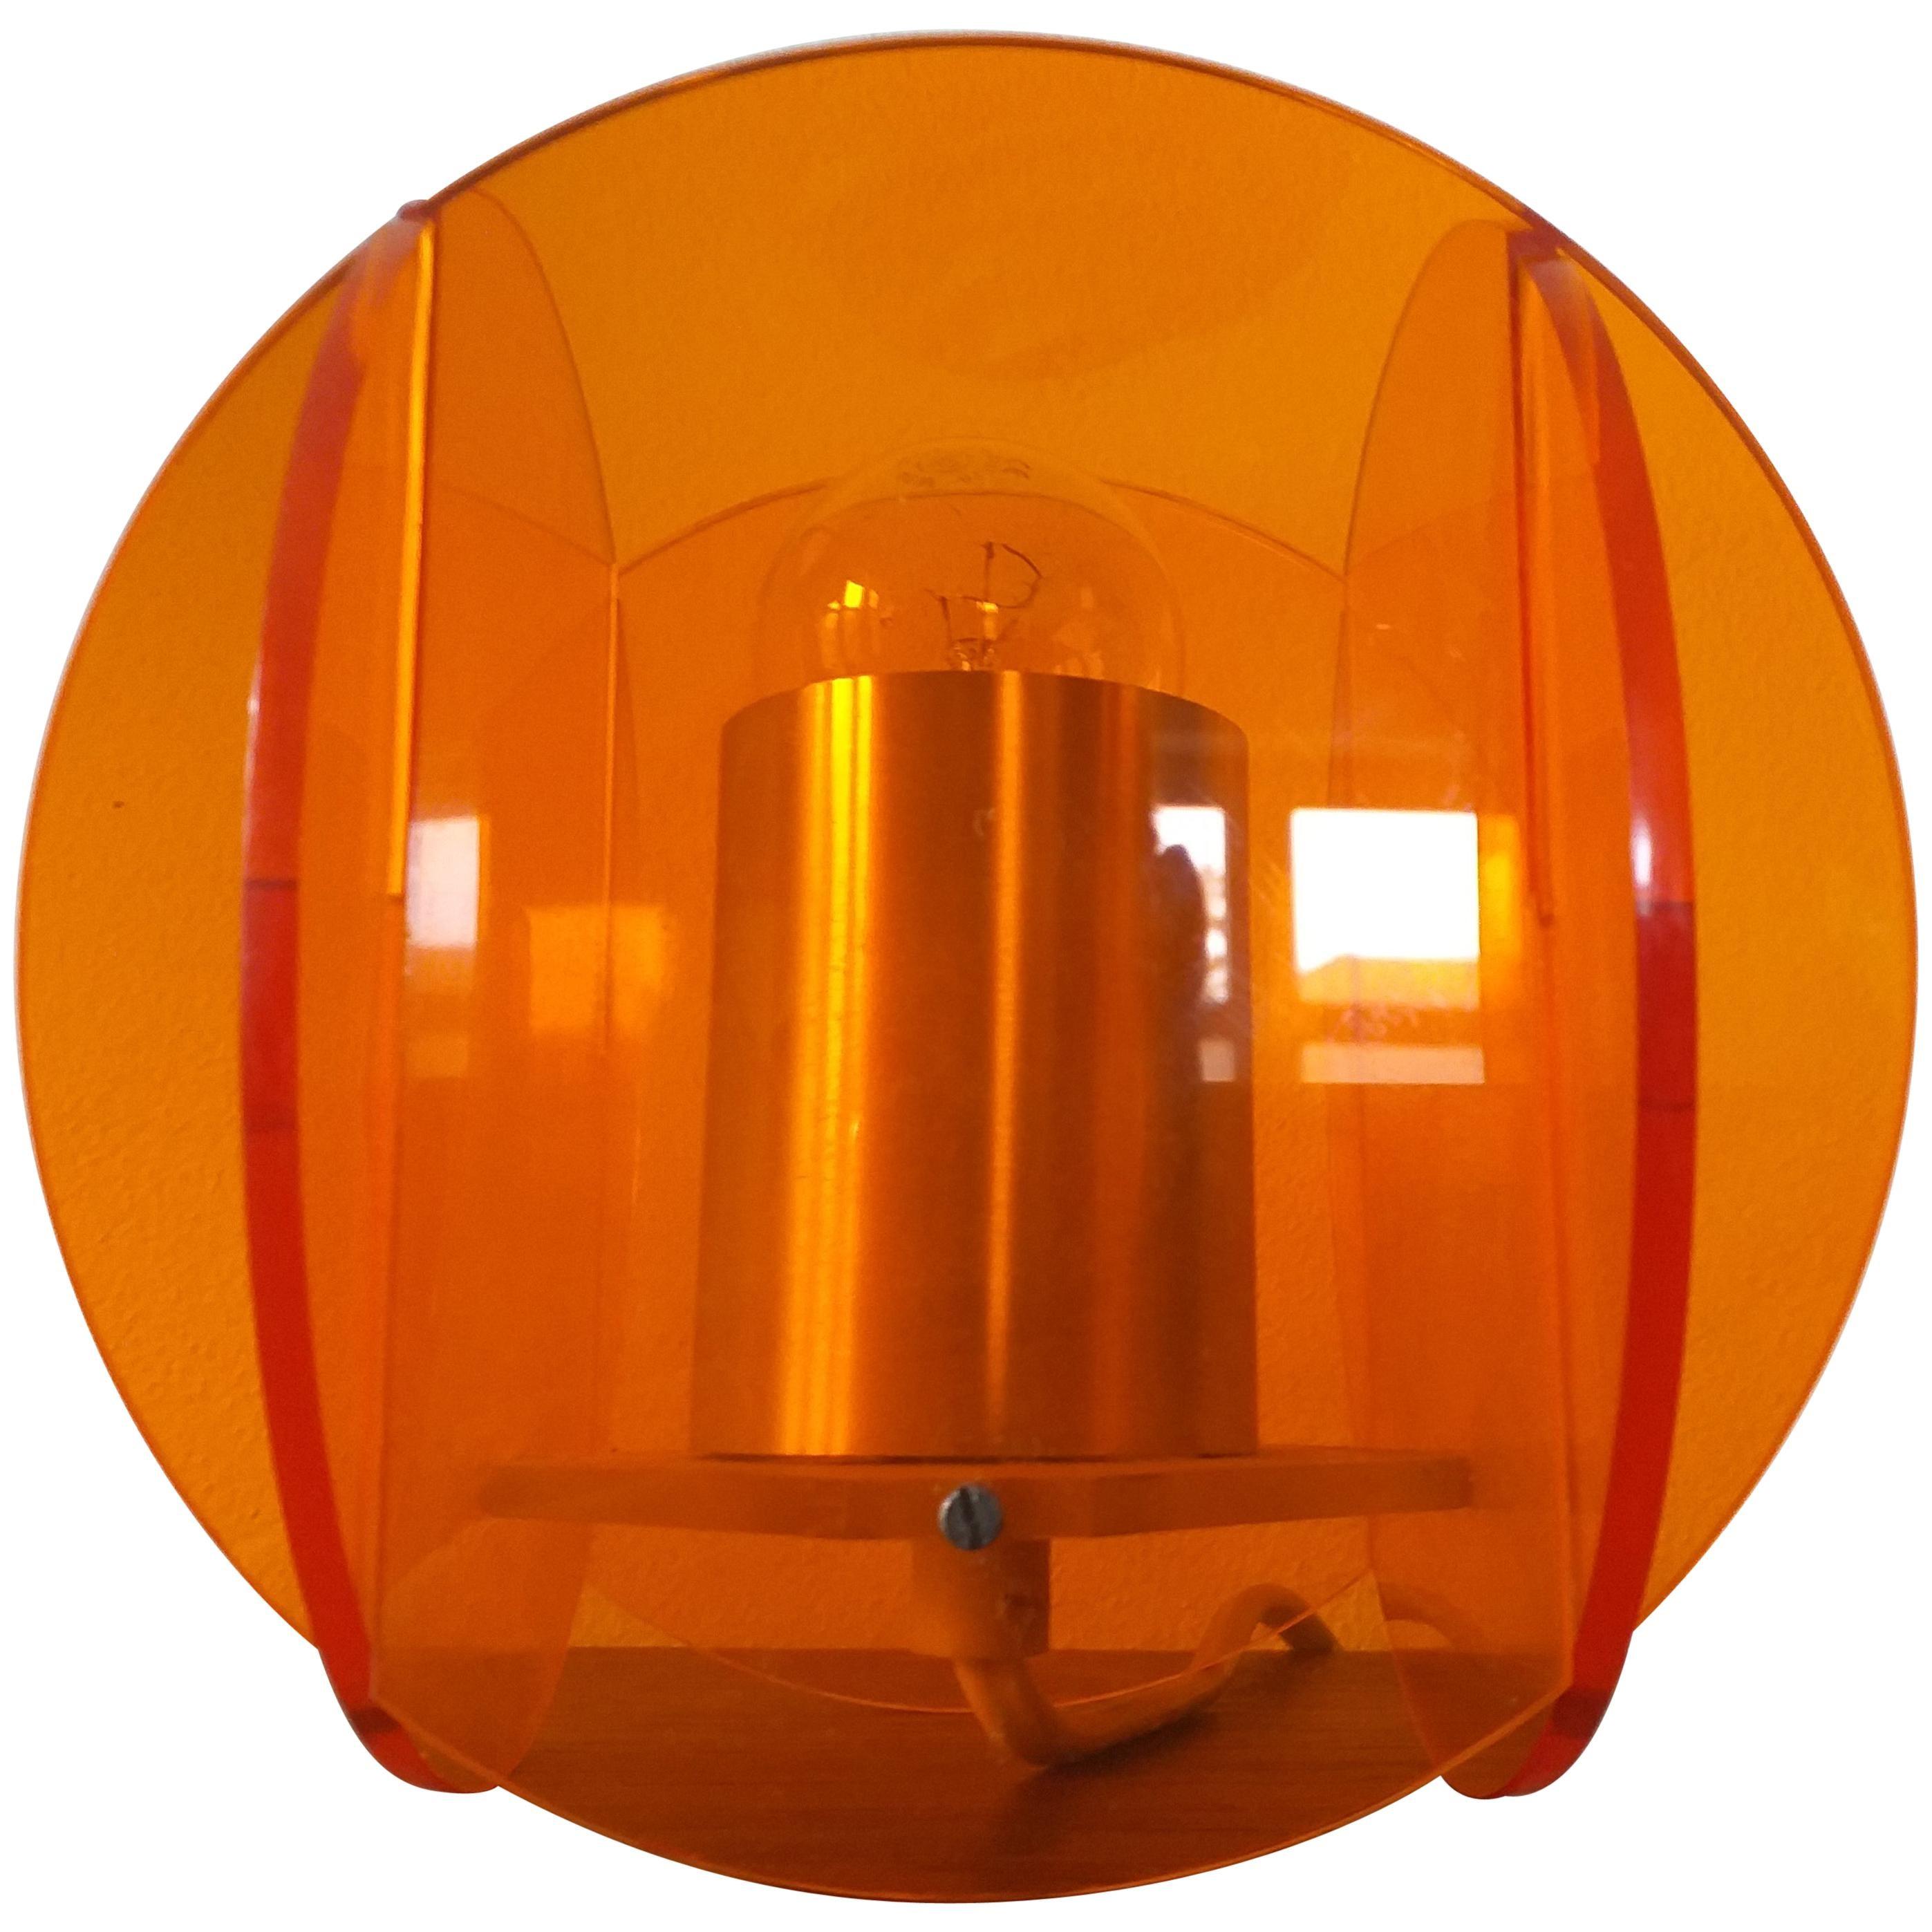 Midcentury Plexiglass Table Lamp, 1970s